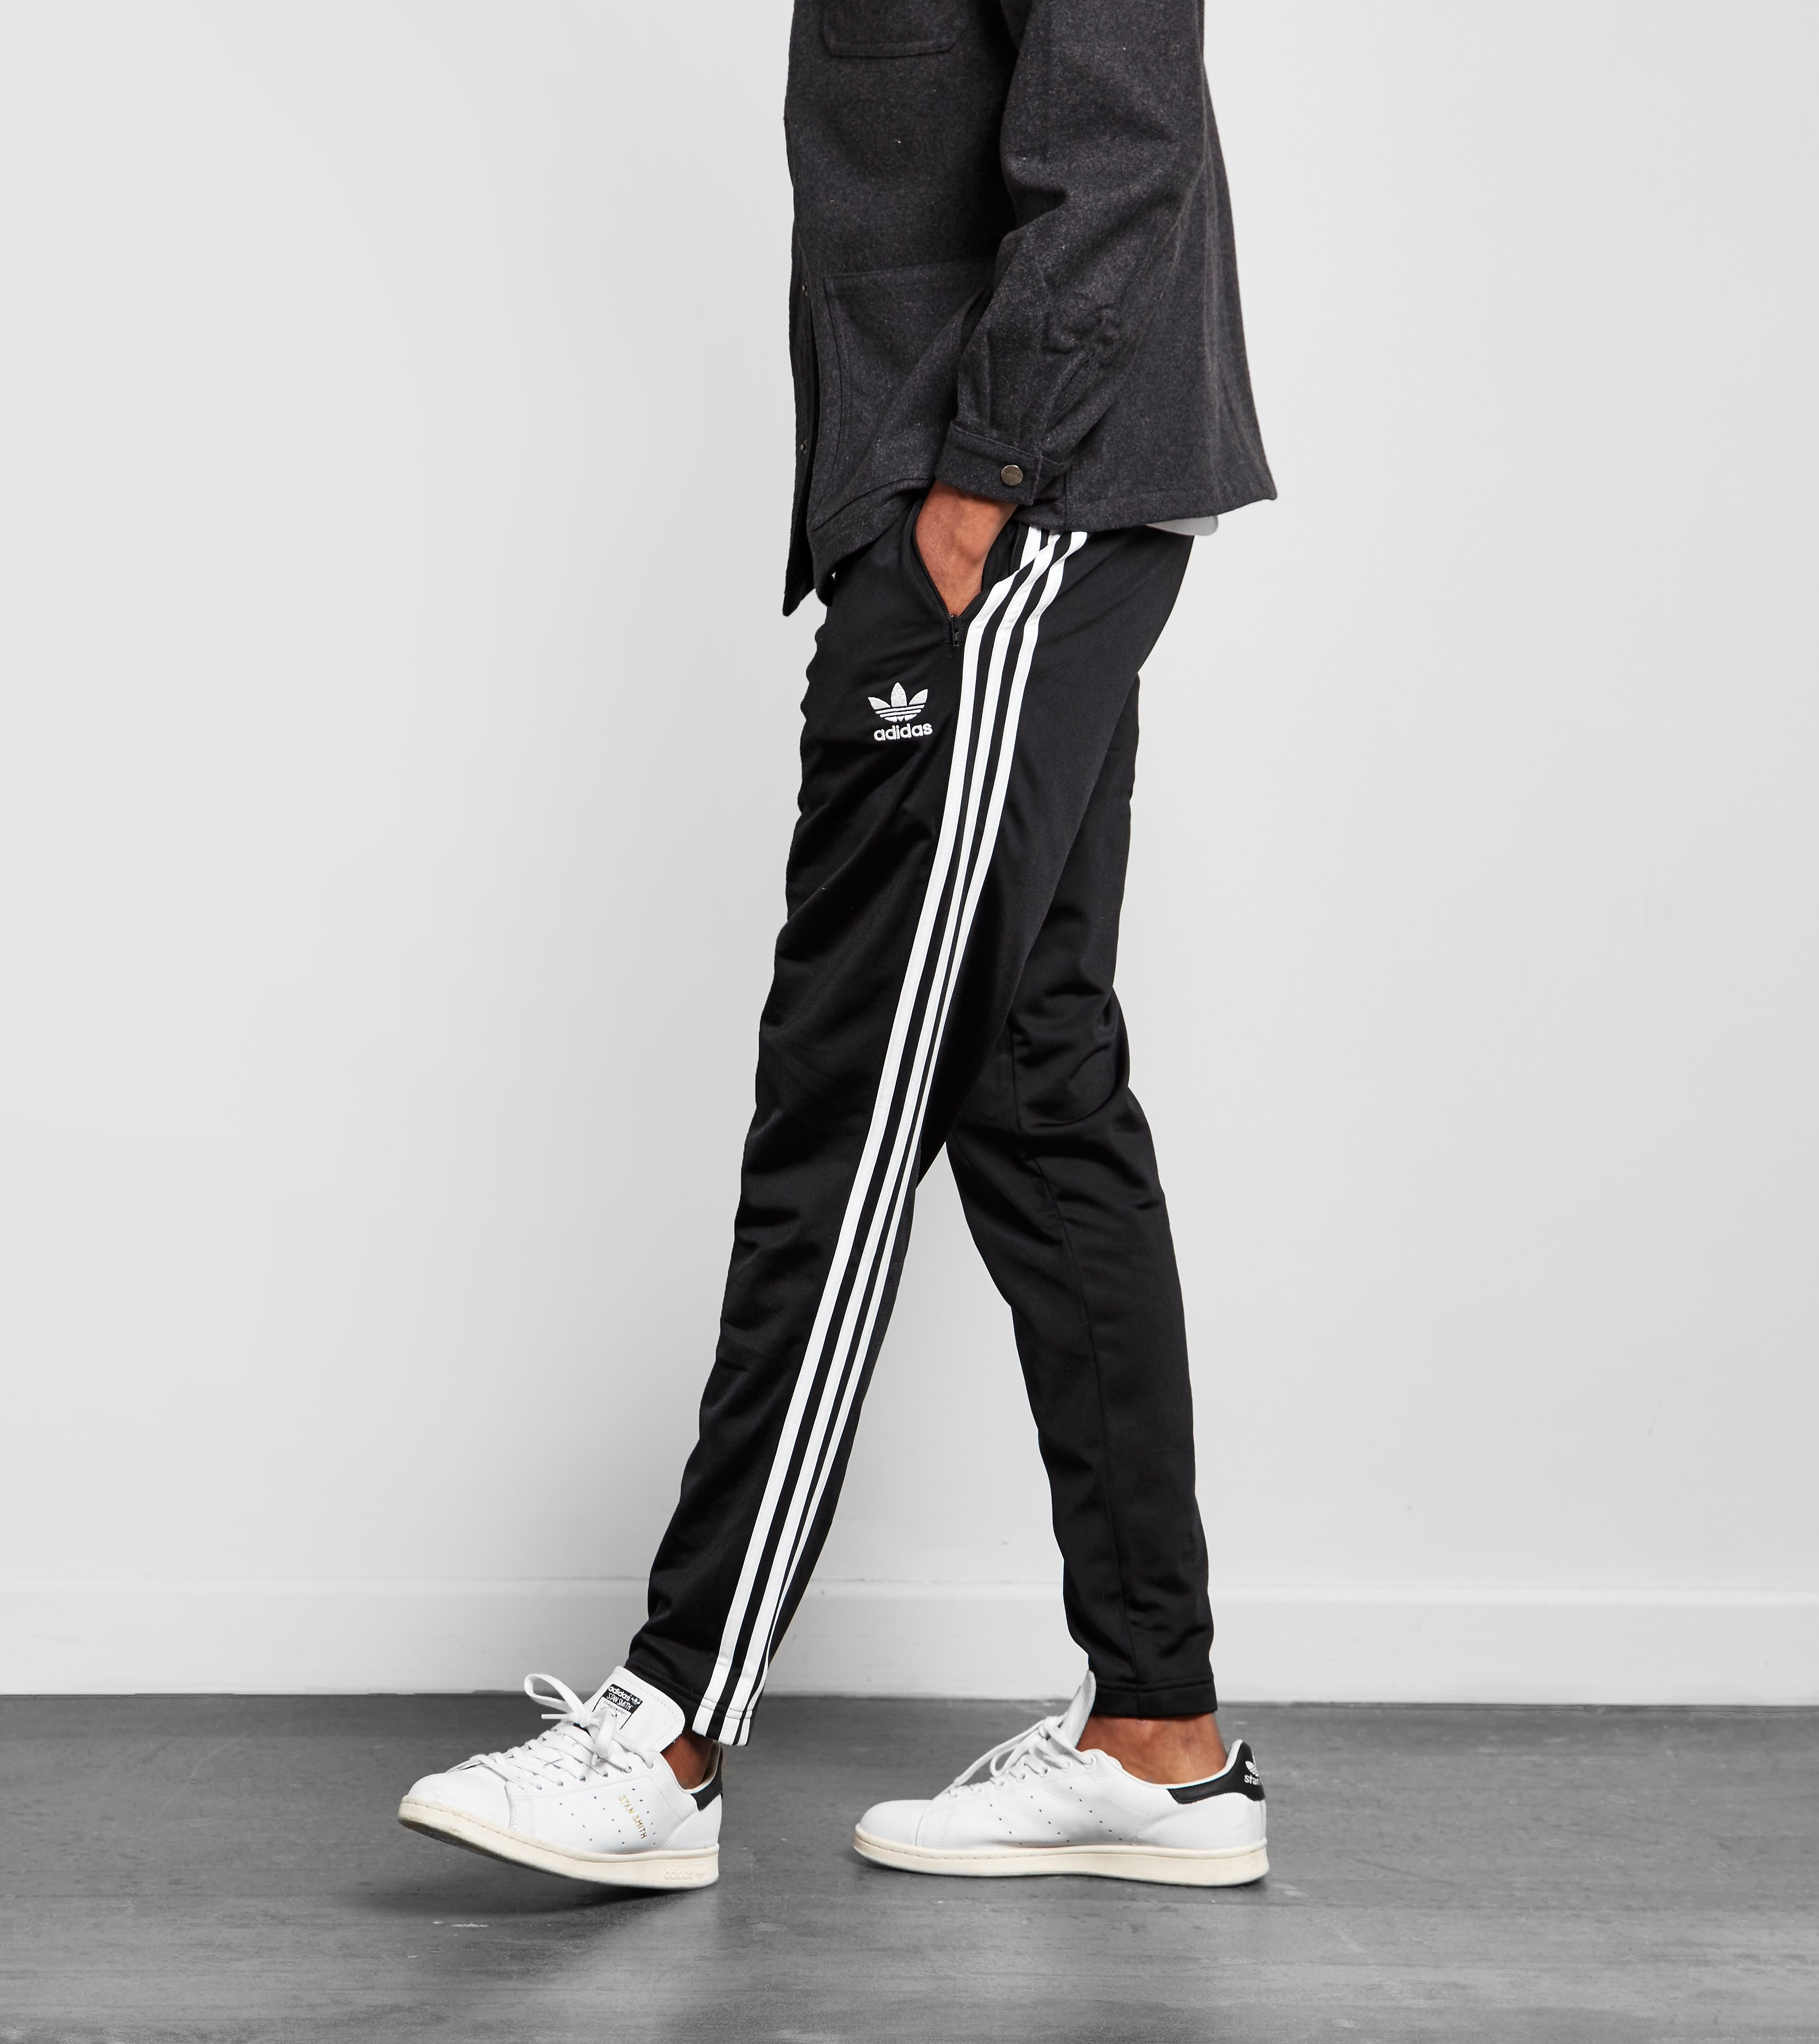 adidas Originals Superstar Taper Track Pants